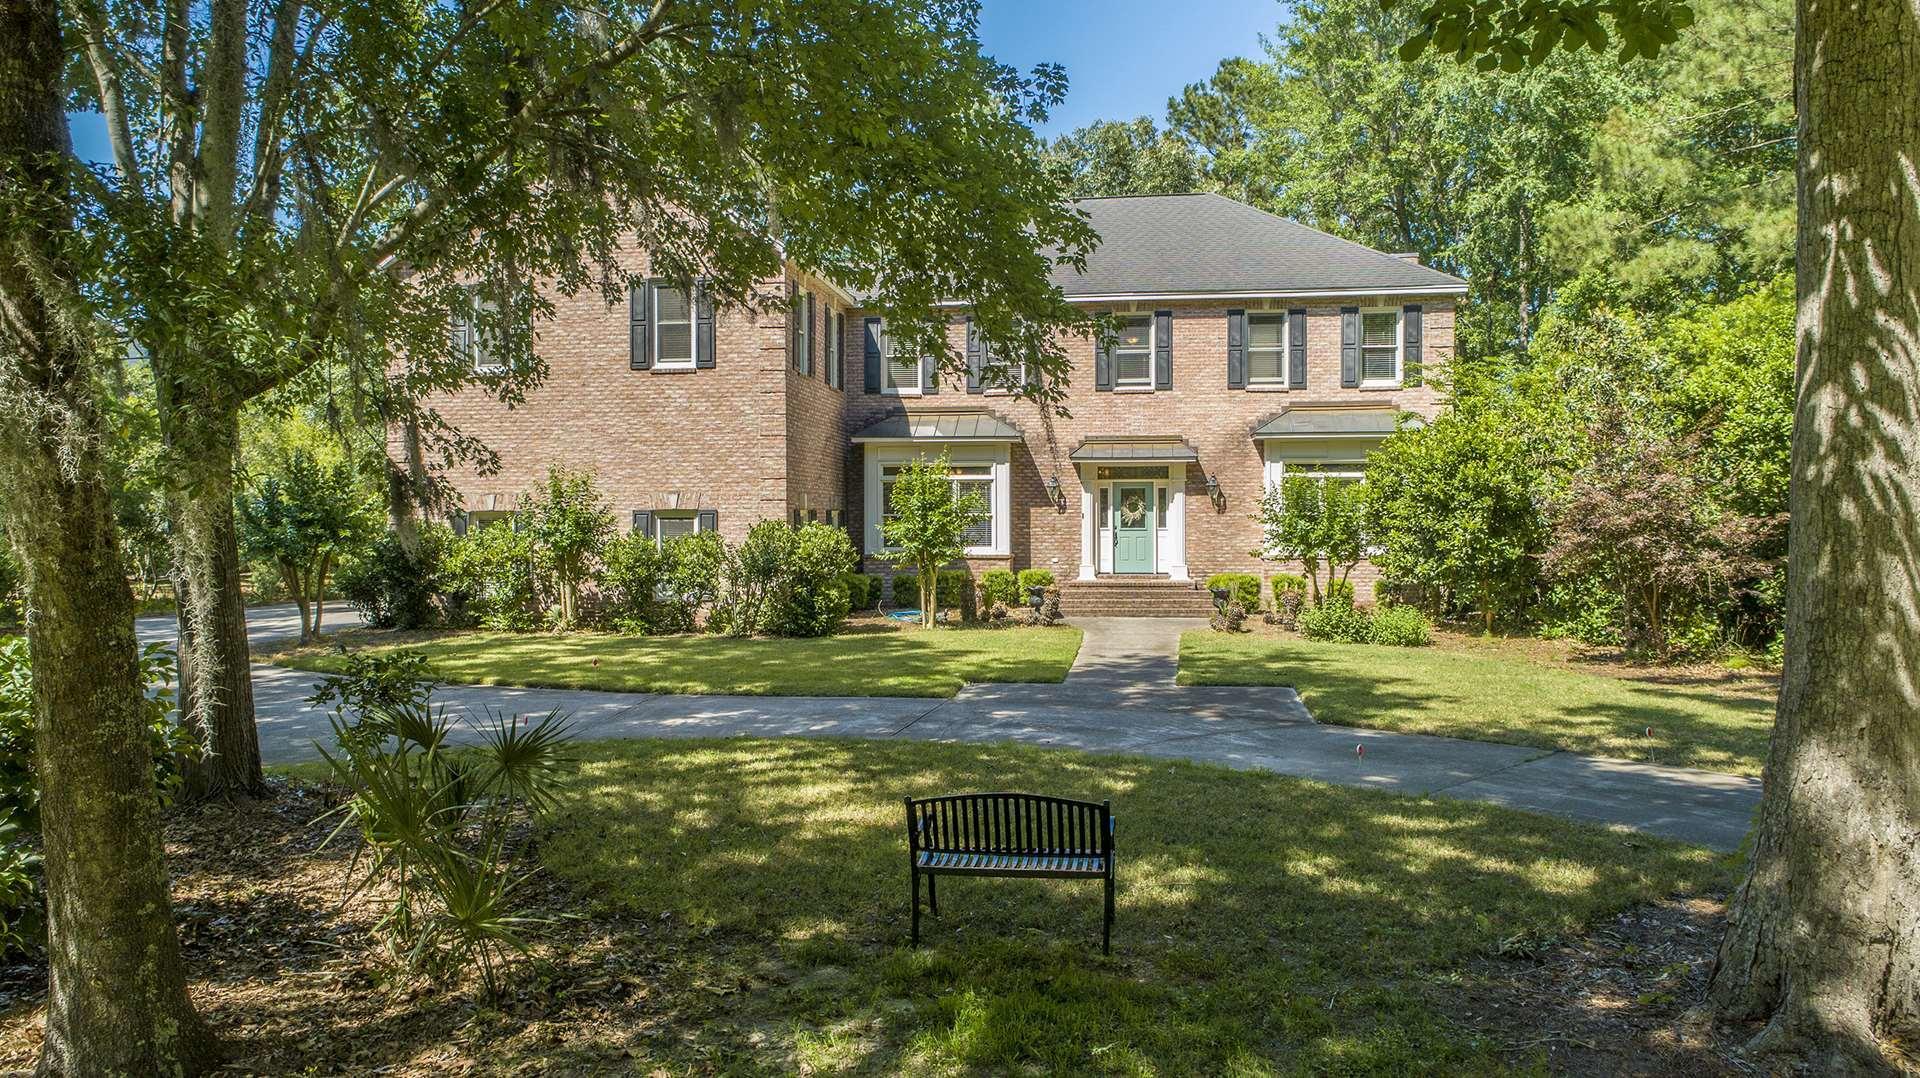 Dunes West Homes For Sale - 2961 Pignatelli, Mount Pleasant, SC - 40